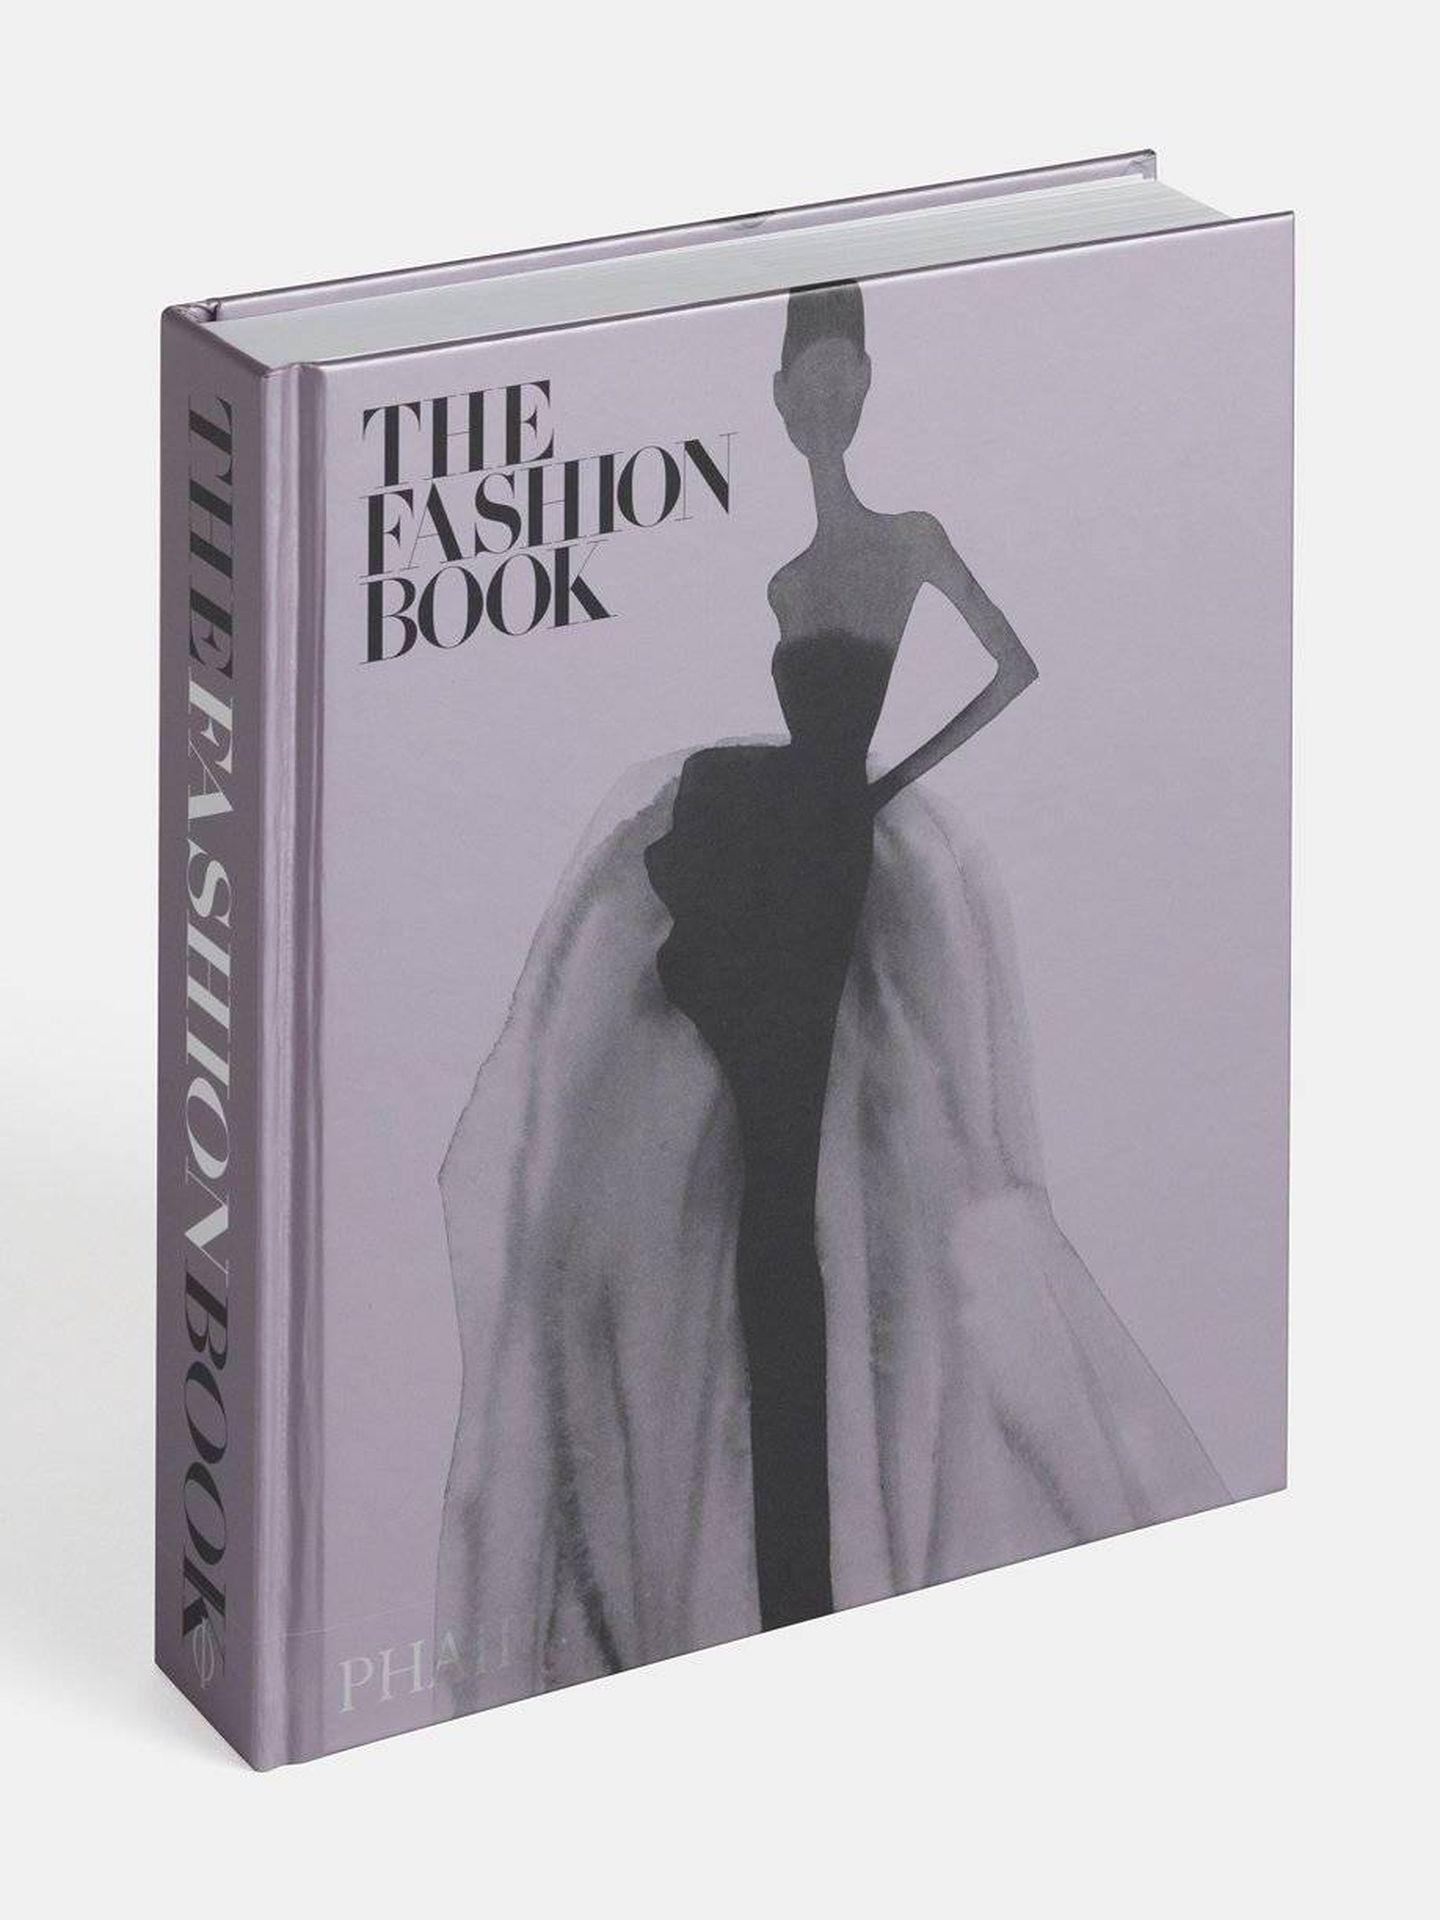 El libro 'The Fashion Book', Ed. Phaidon. (Cortesía)